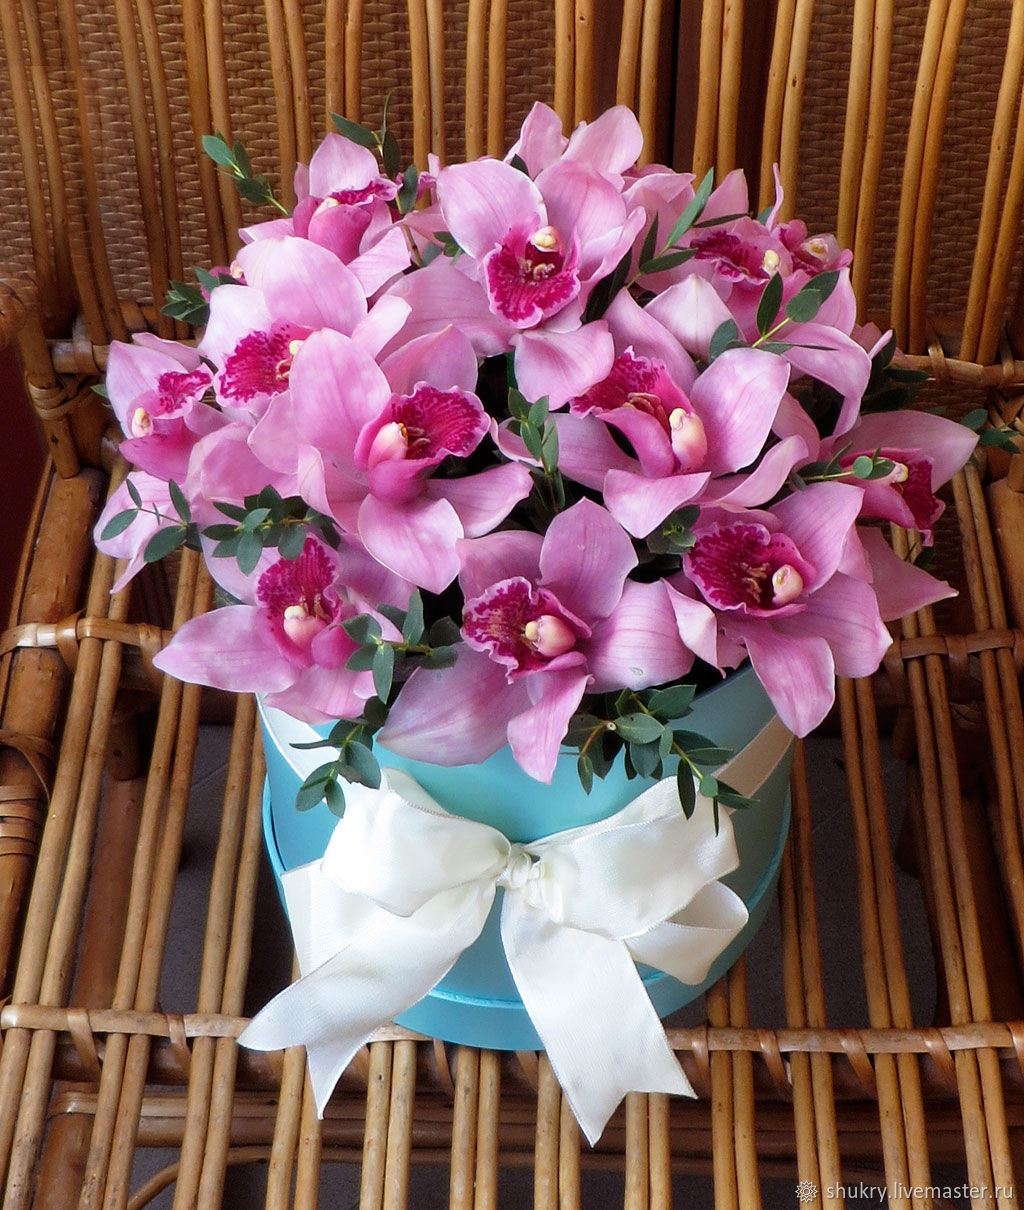 aa147ba1b0c8fb7ed631d992c8we--tsvety-i-floristika-shlyapnaya-korobka-orhidei.jpg